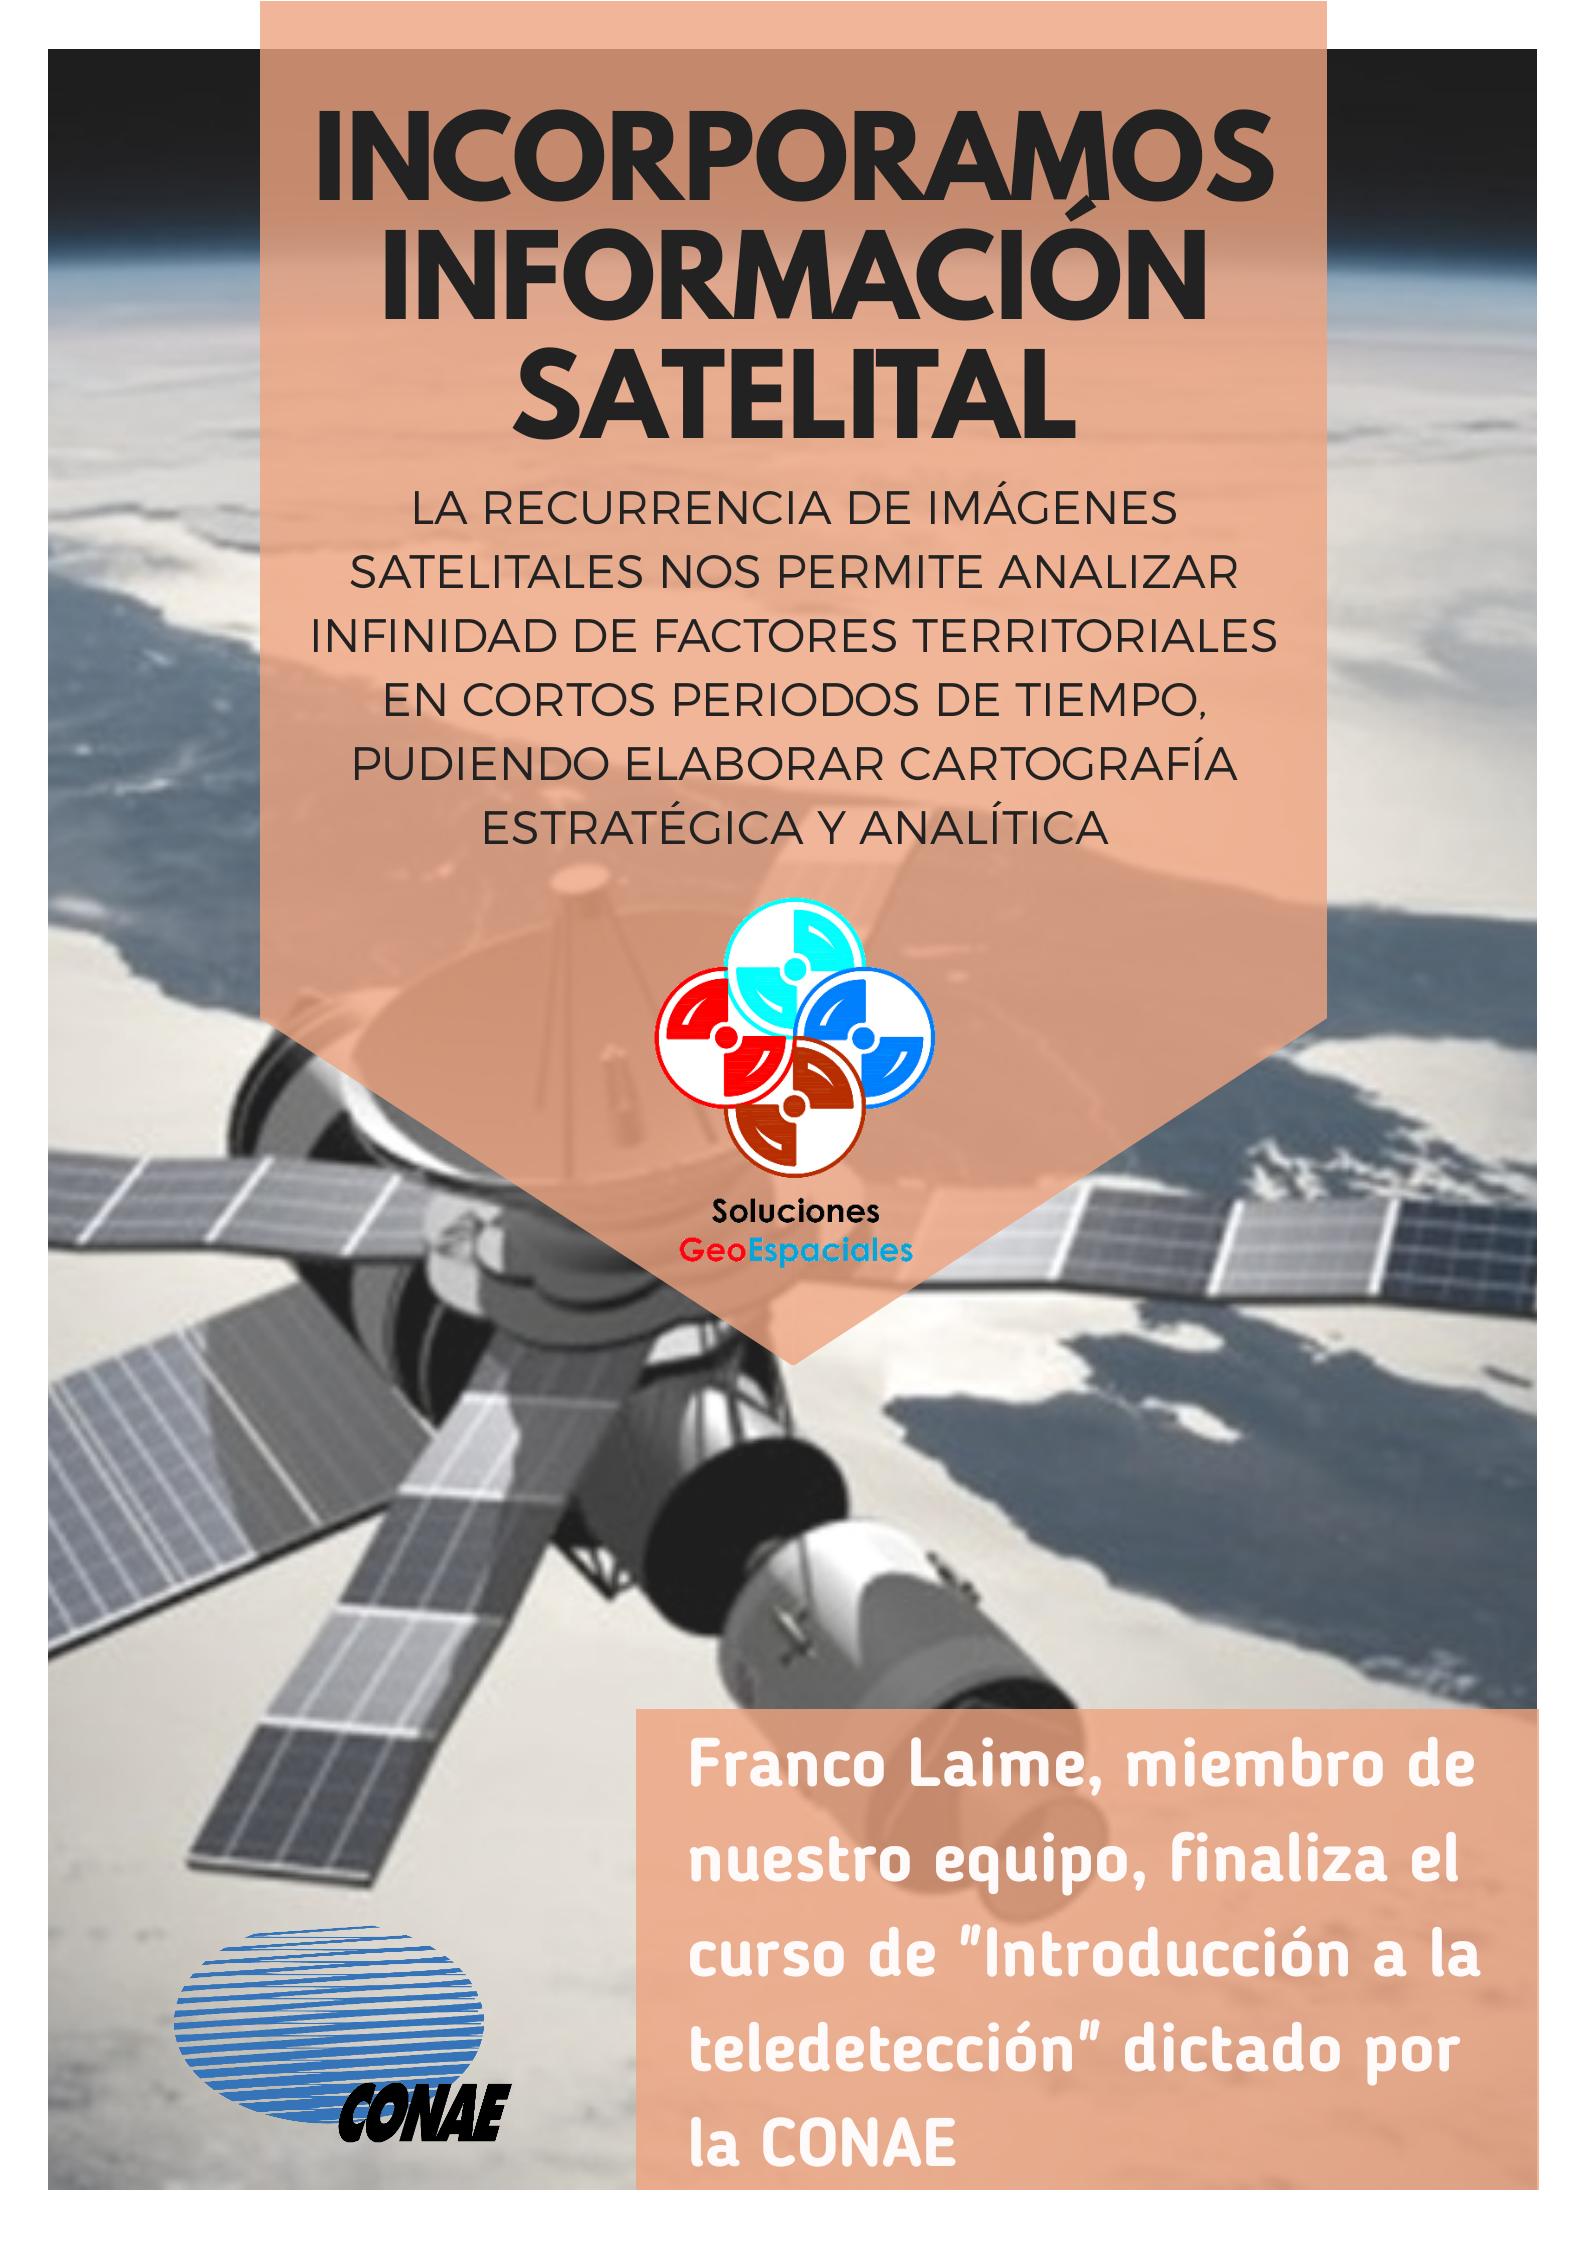 Incorporamos Información Satelital